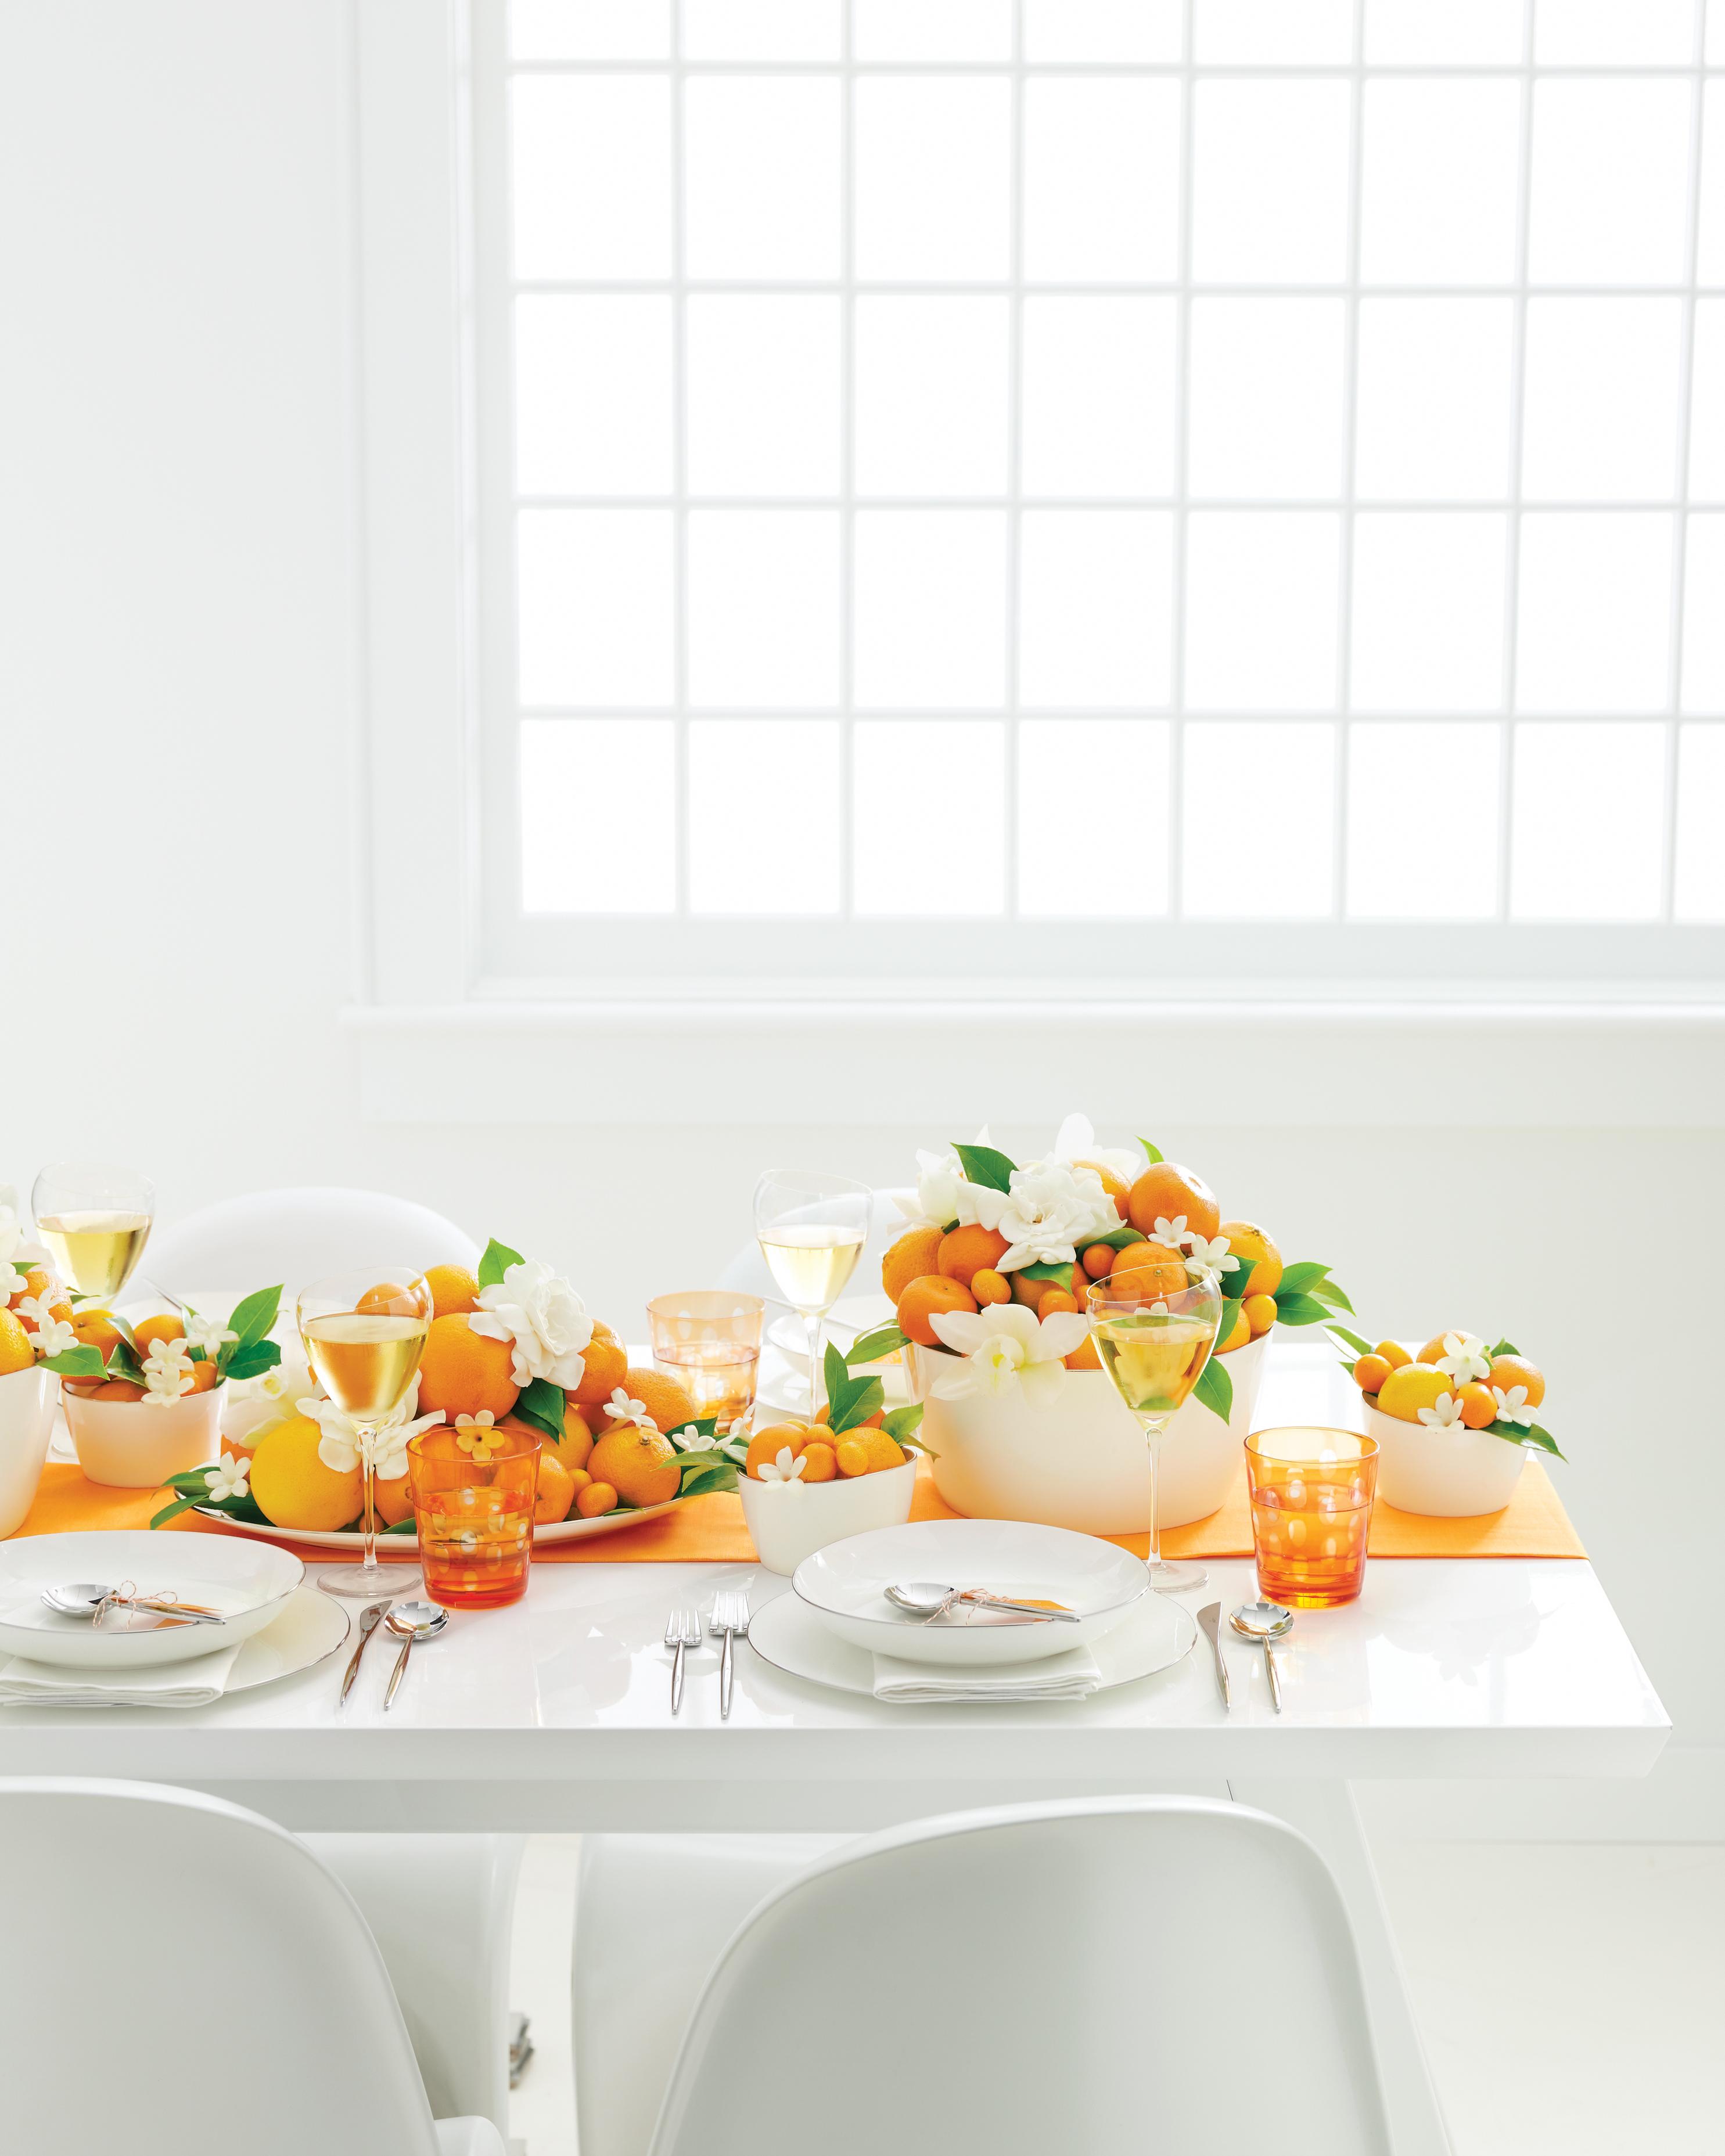 fruit-vegetable-centerpieces-oranges-1114.jpg